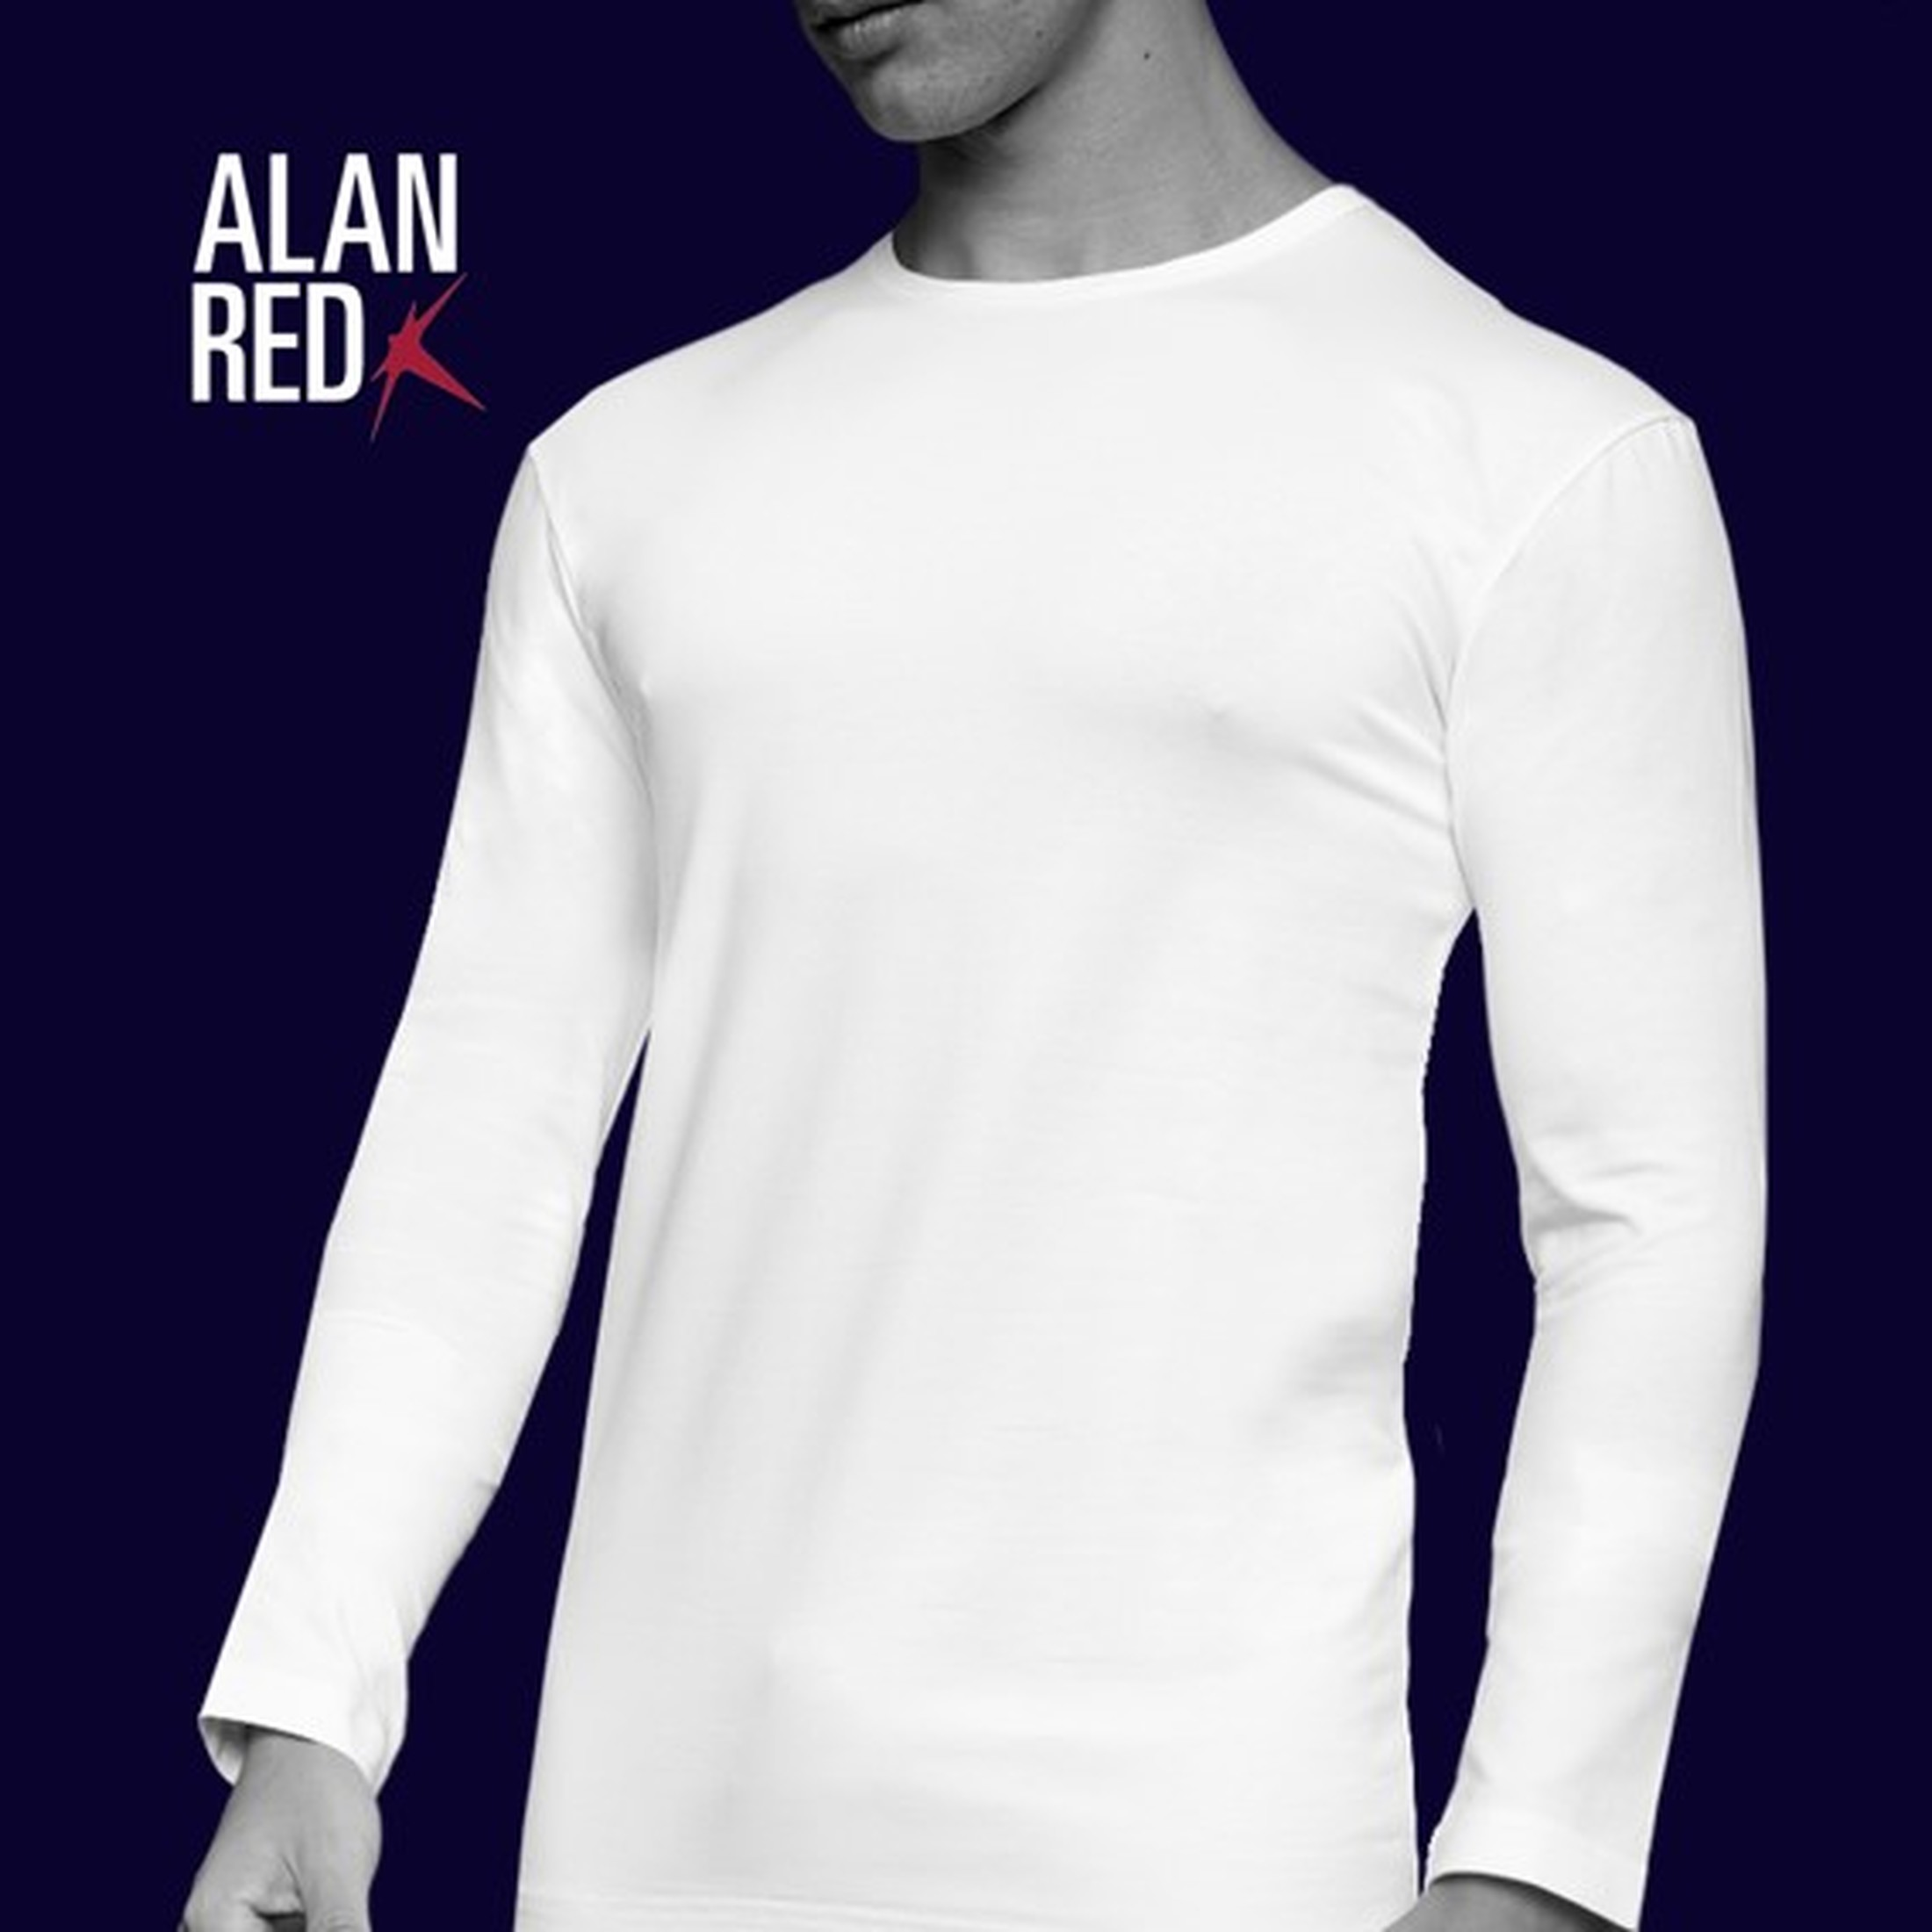 Alan Red Olbia Longsleeve Wit (1Pack)